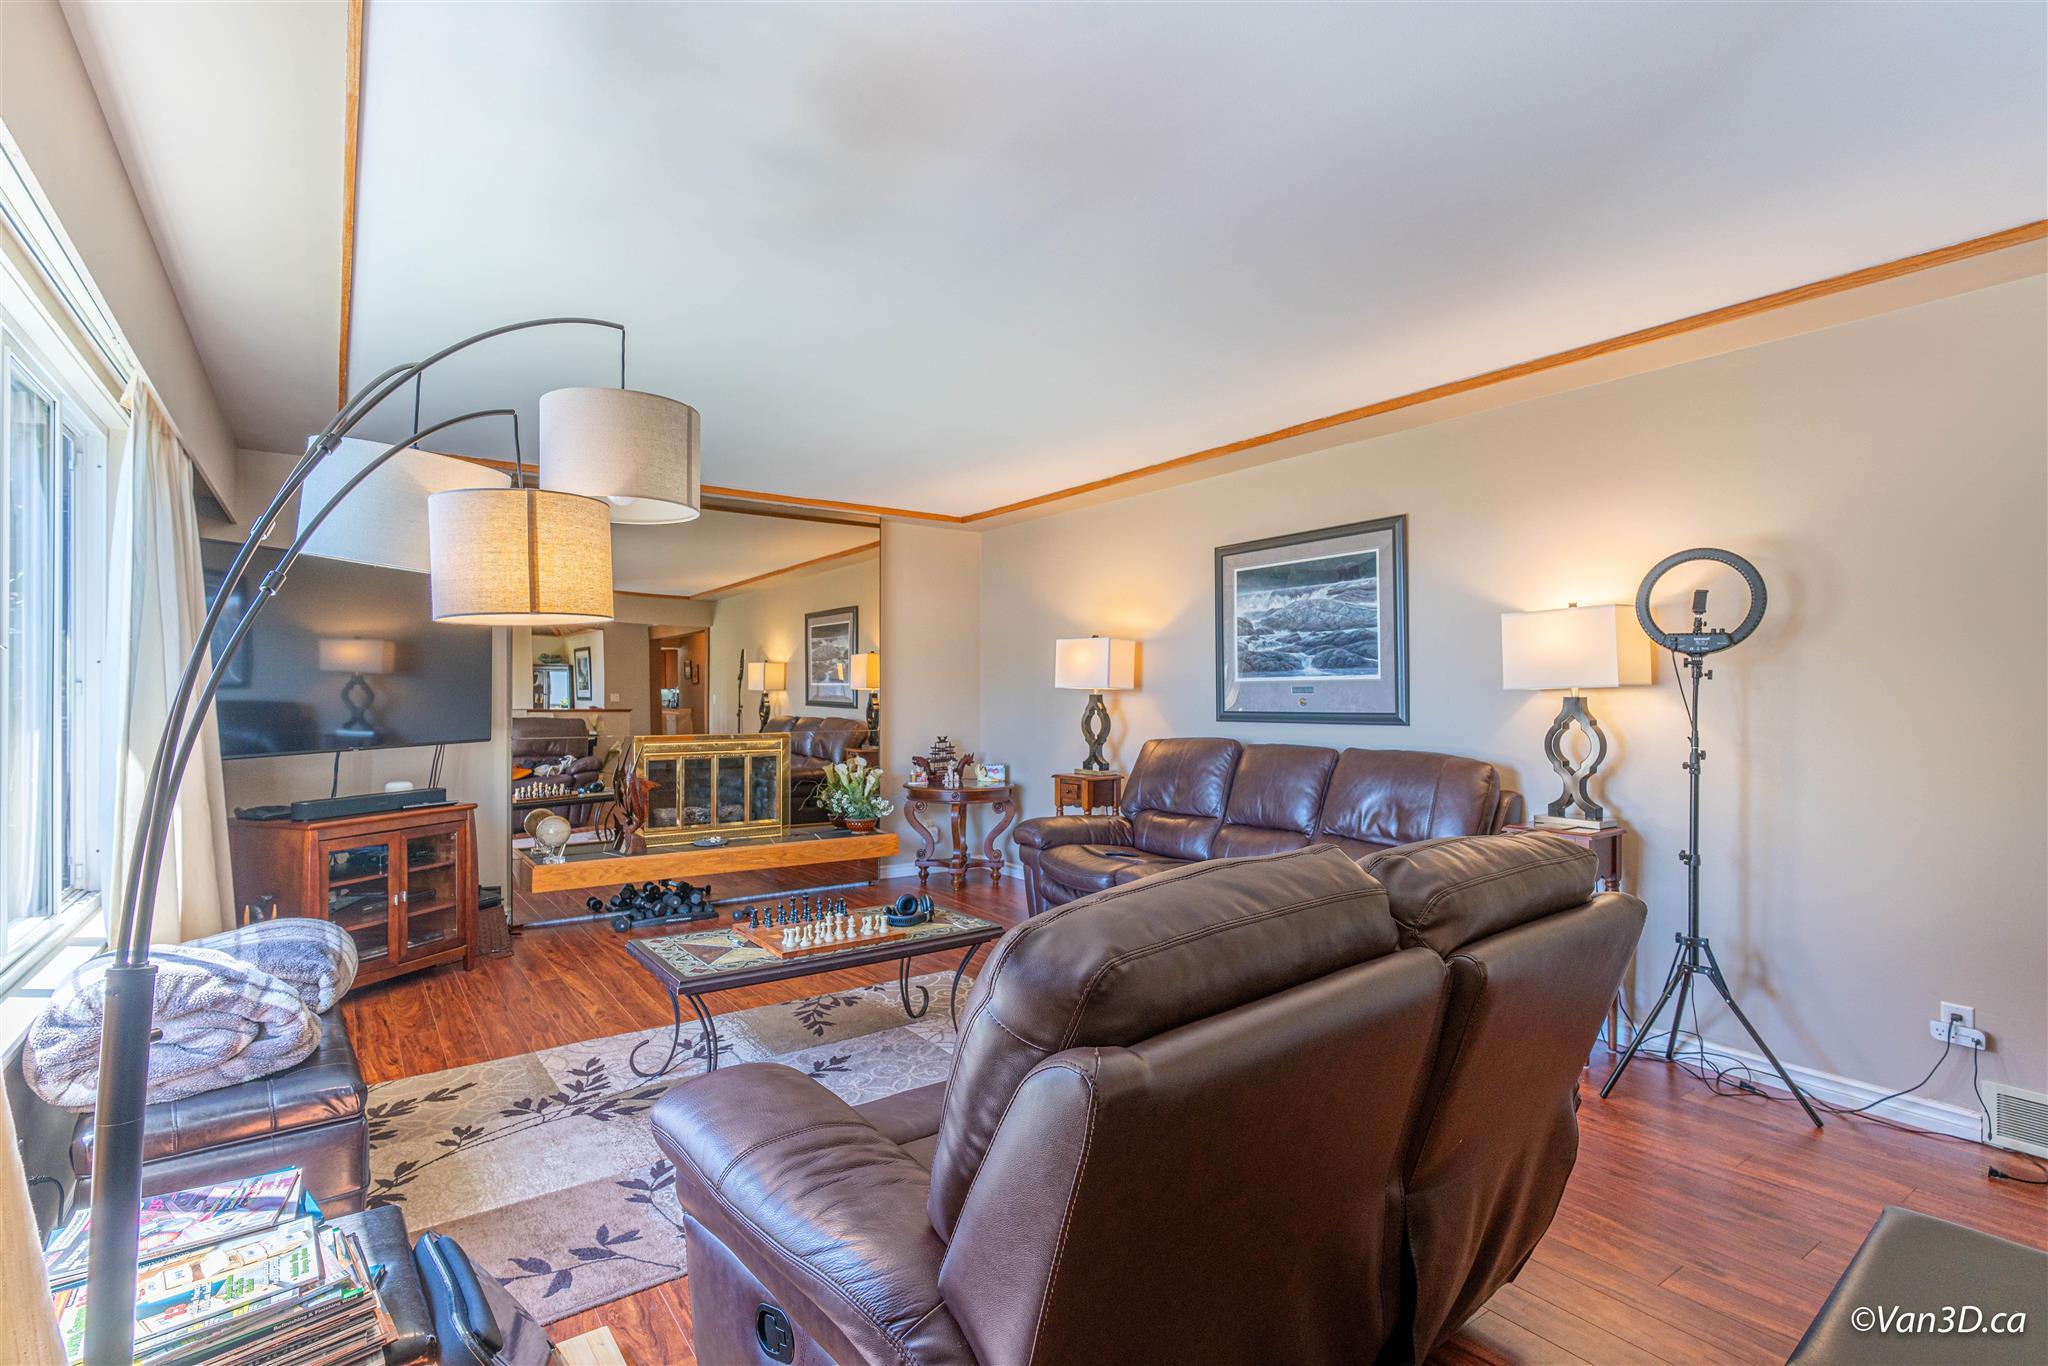 14495 MANN PARK CRESCENT - White Rock House/Single Family for sale, 4 Bedrooms (R2604561) - #19